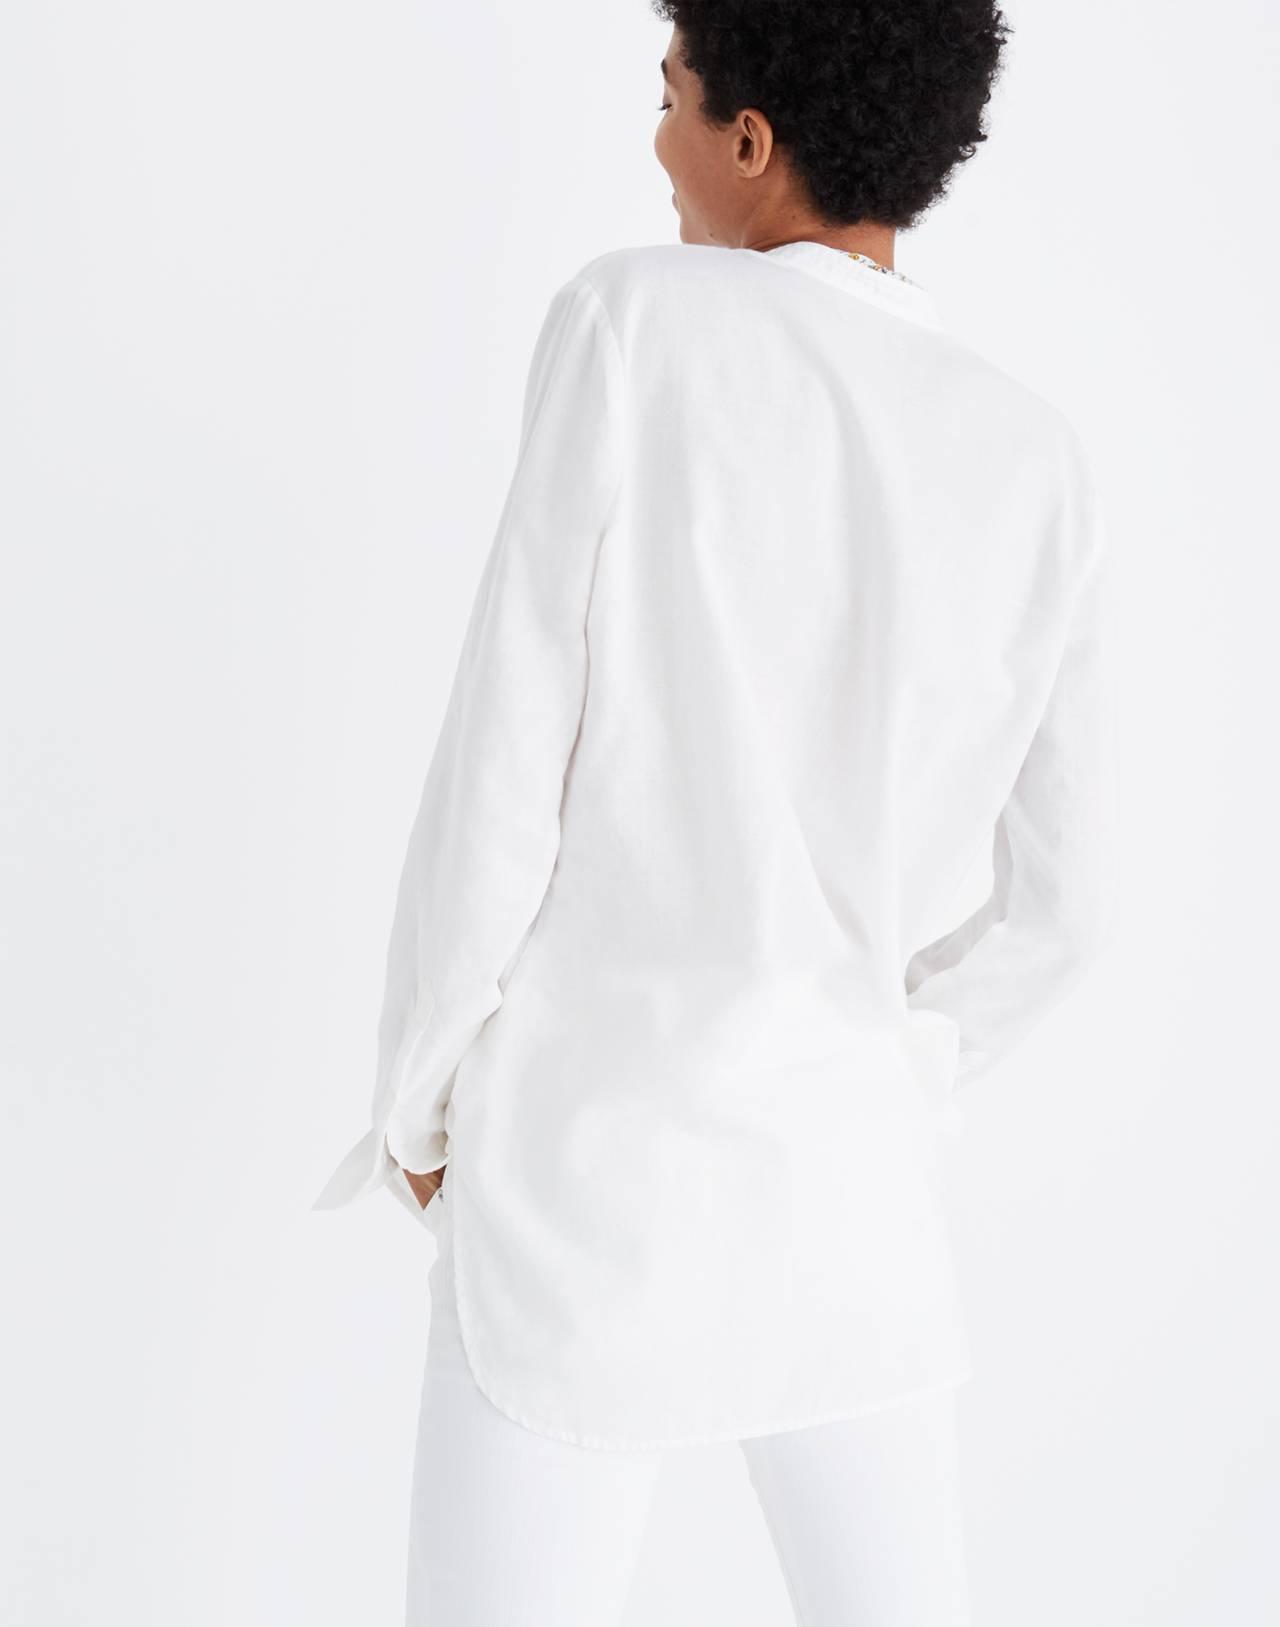 Wellspring Tunic Popover Shirt in eyelet white image 3